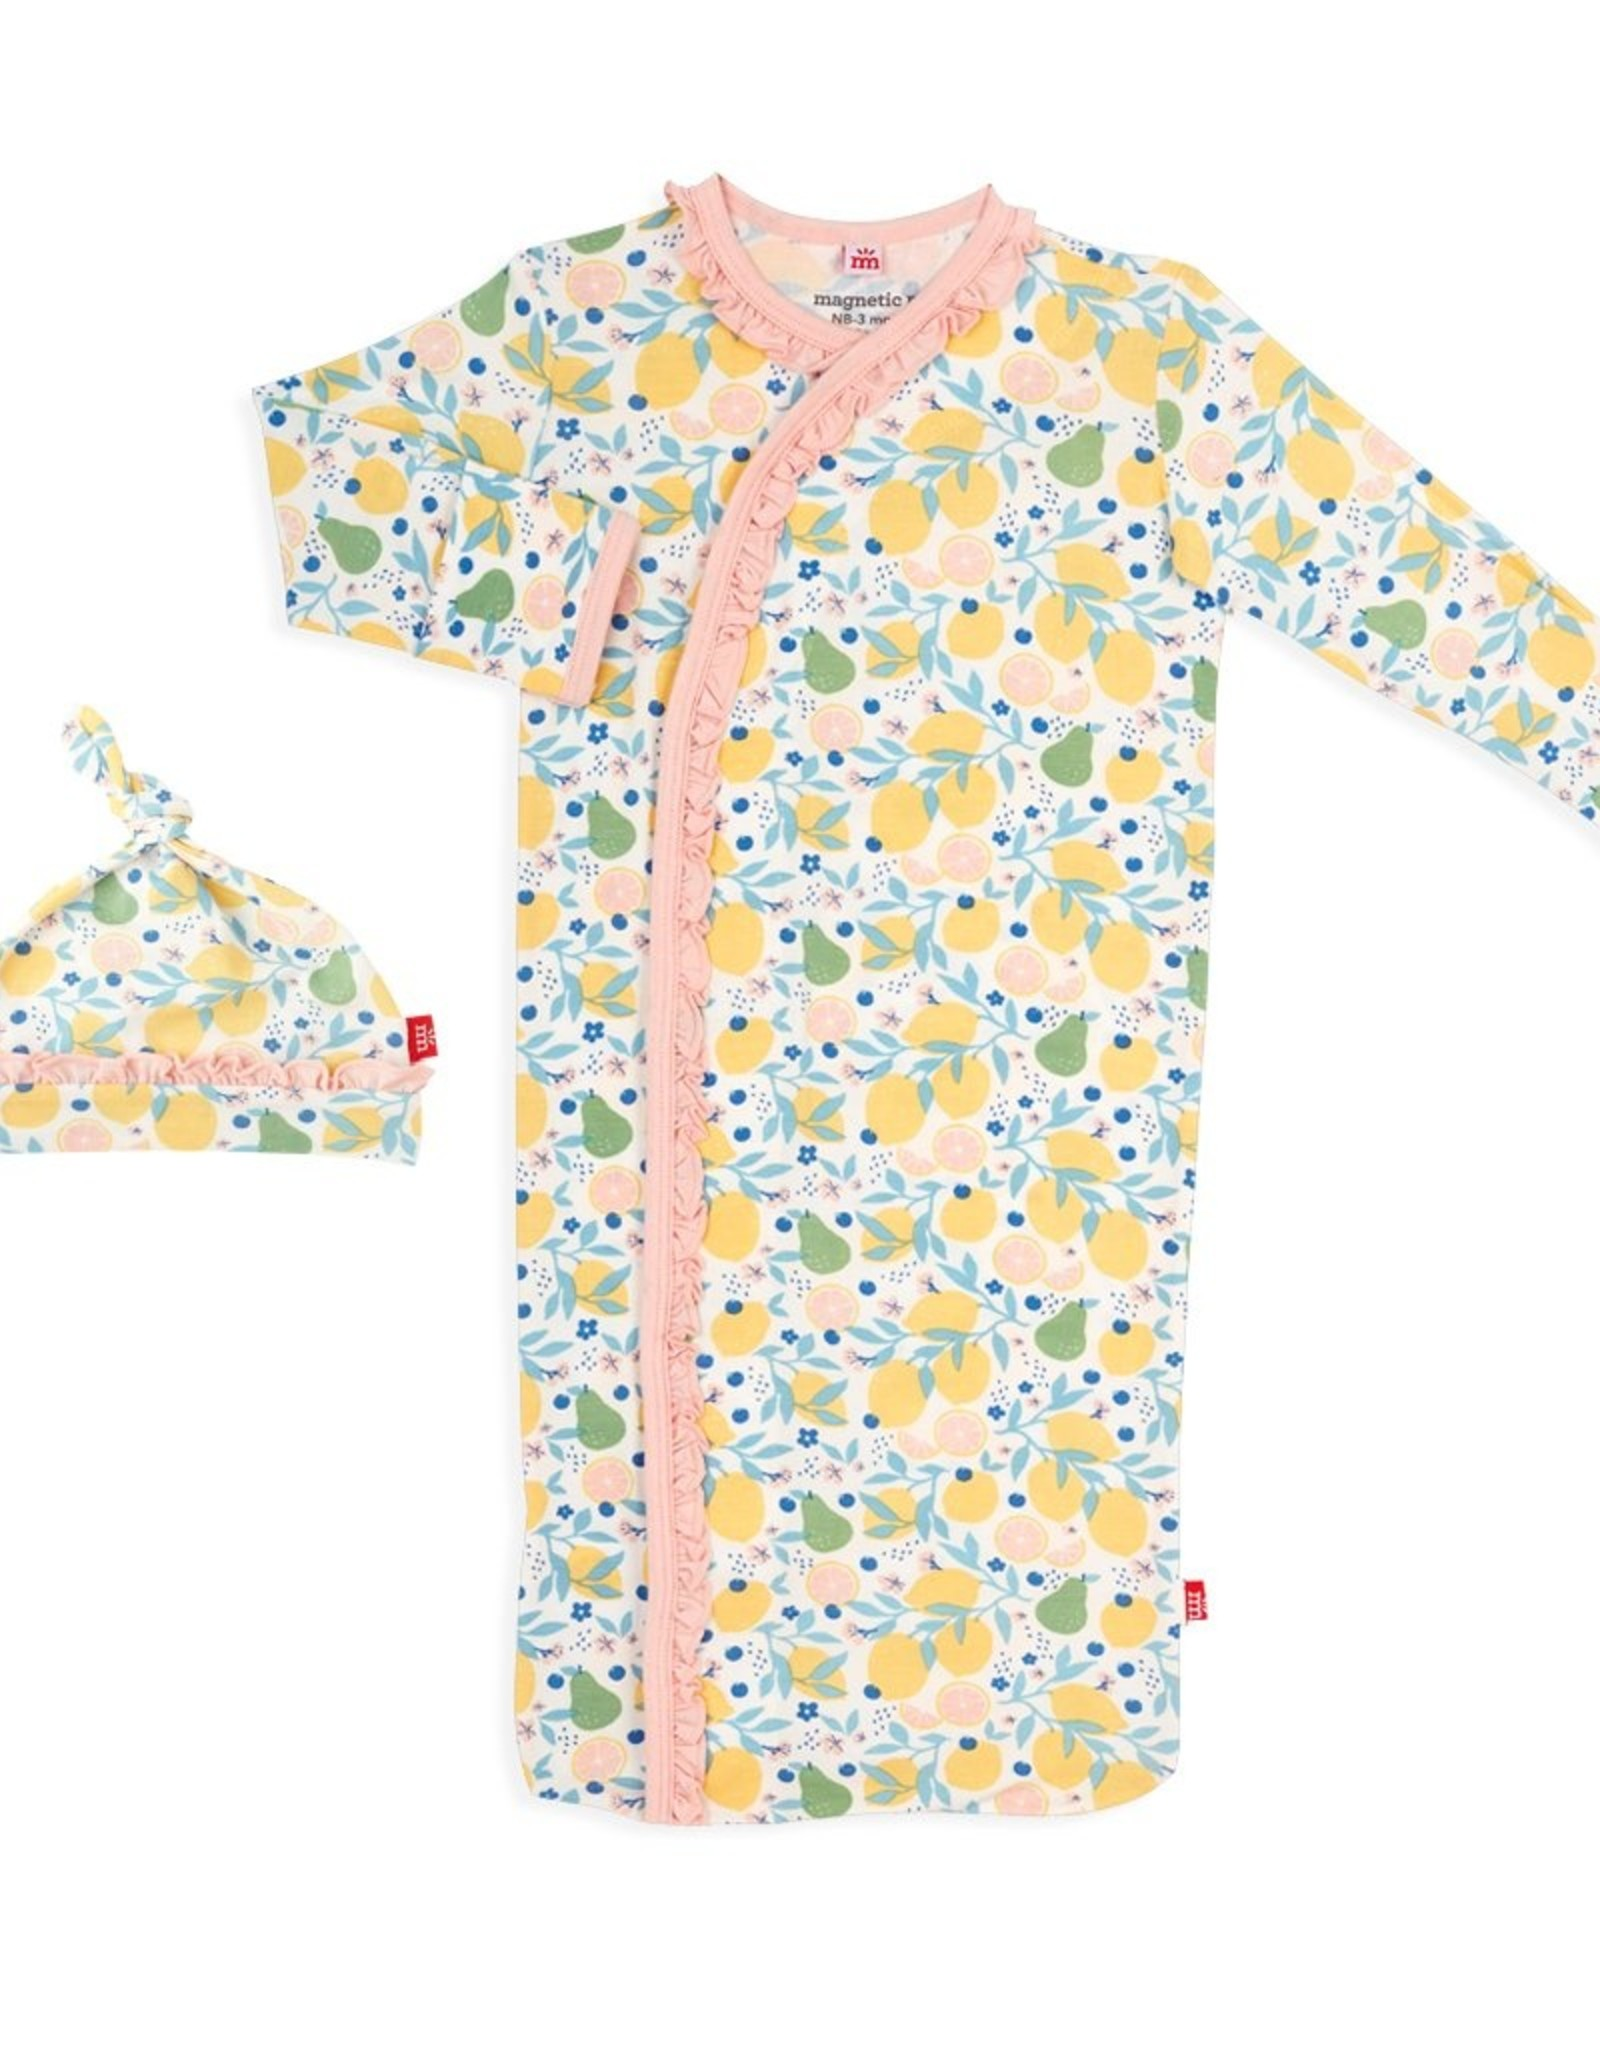 Magnetic Me Citrus Bloom Modal Magnetic Gown Set